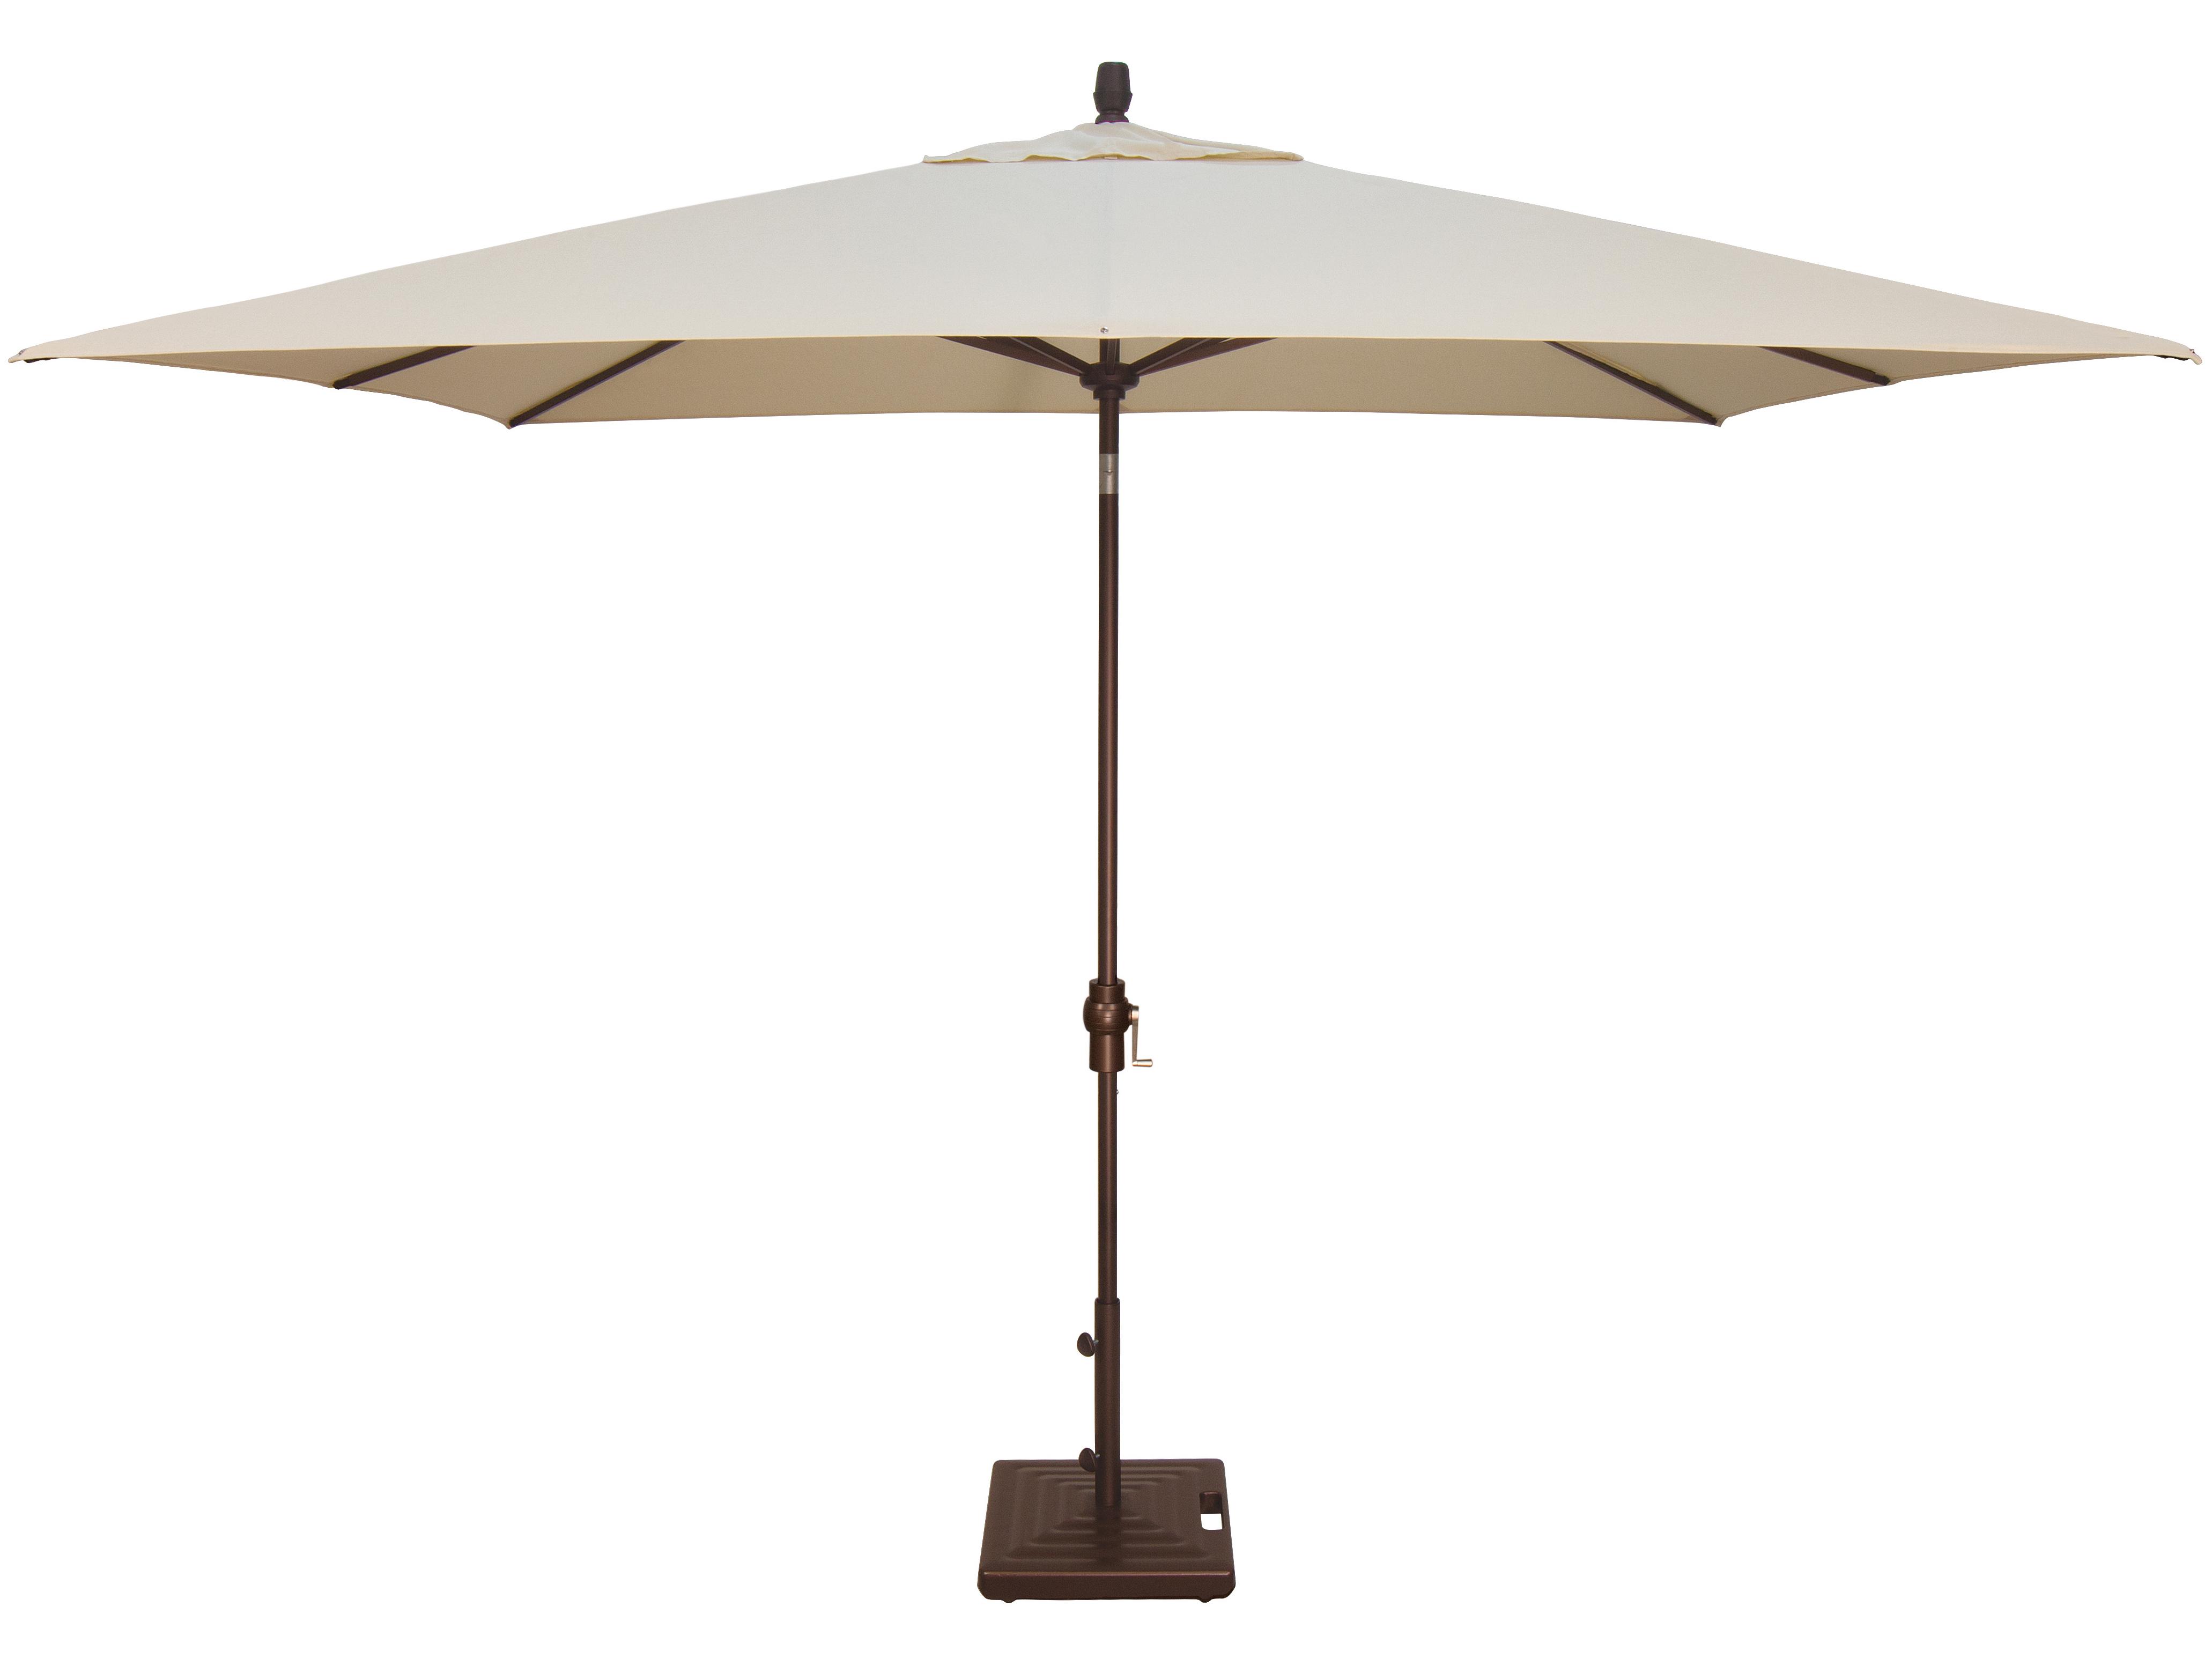 Treasure Garden Market Aluminum 8x10 Foot Rectangular Crank Lift Auto Tilt Umbrella Exum8810rt